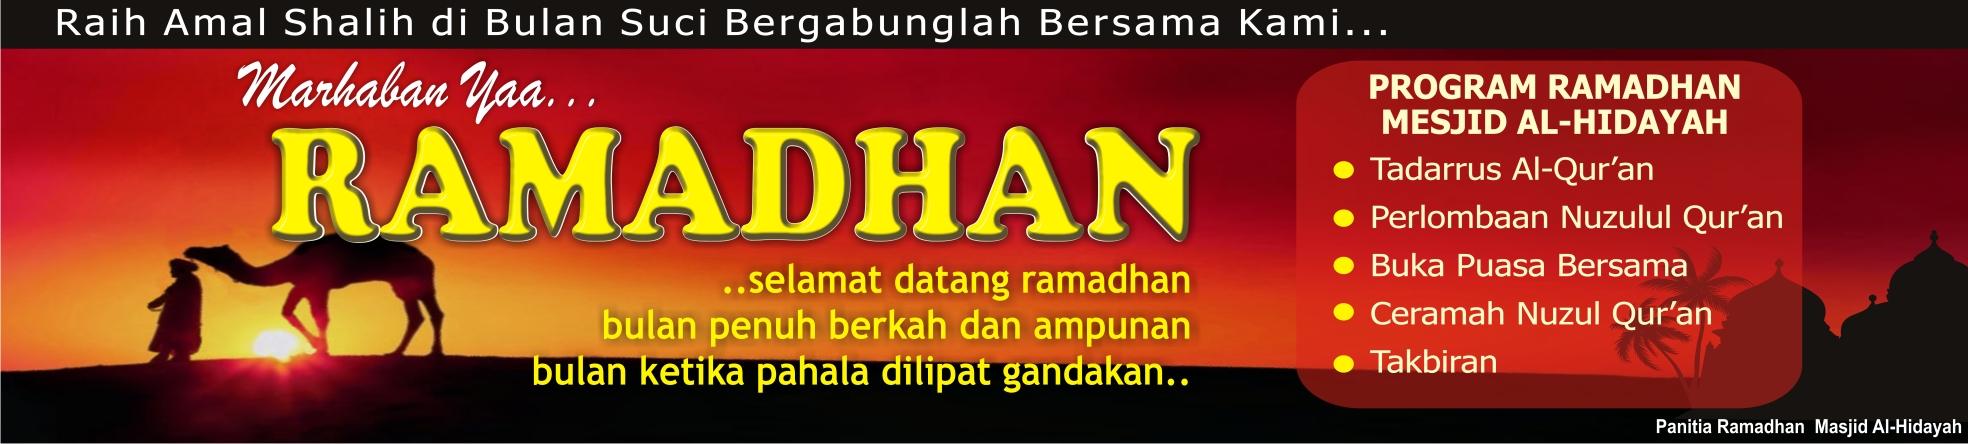 Spanduk Marhaban Ya Ramadhan Enciknas Art